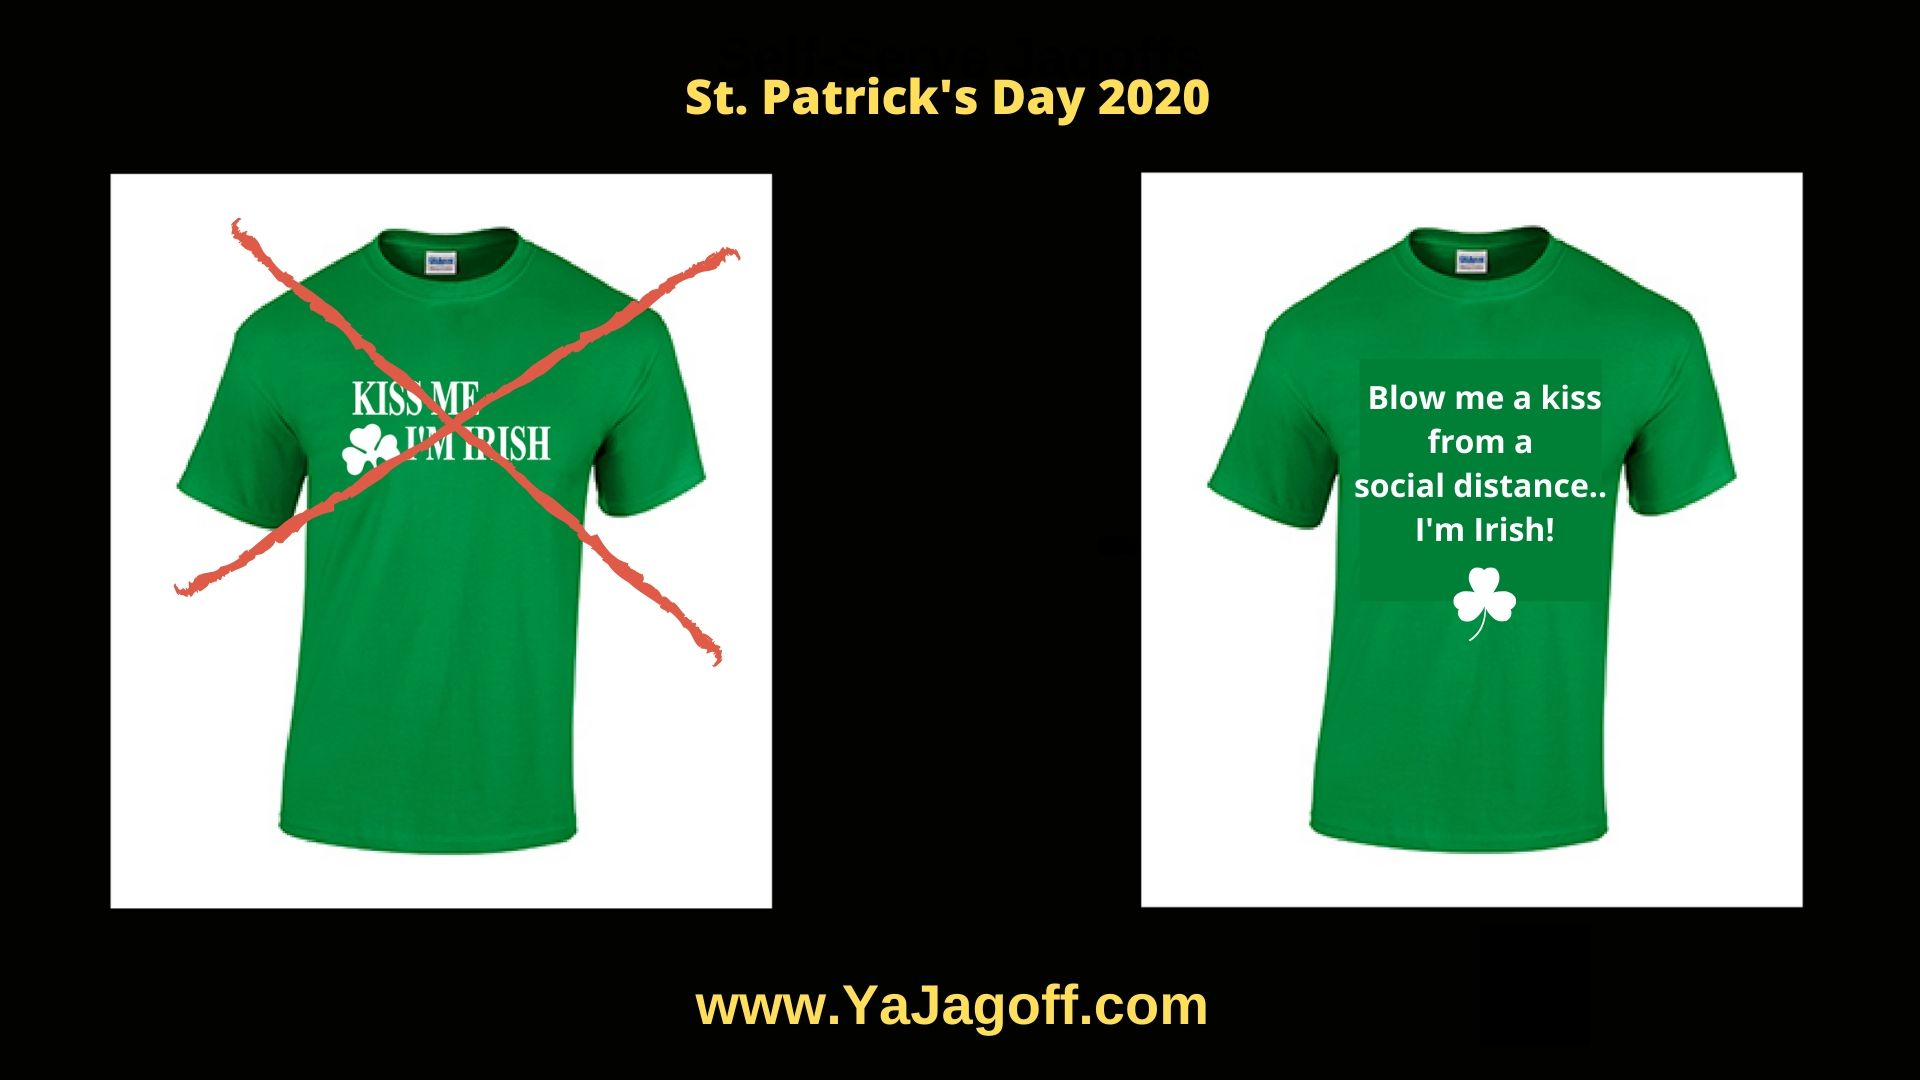 YaJagoff Podcast Coronavirus St. Patrick's Day